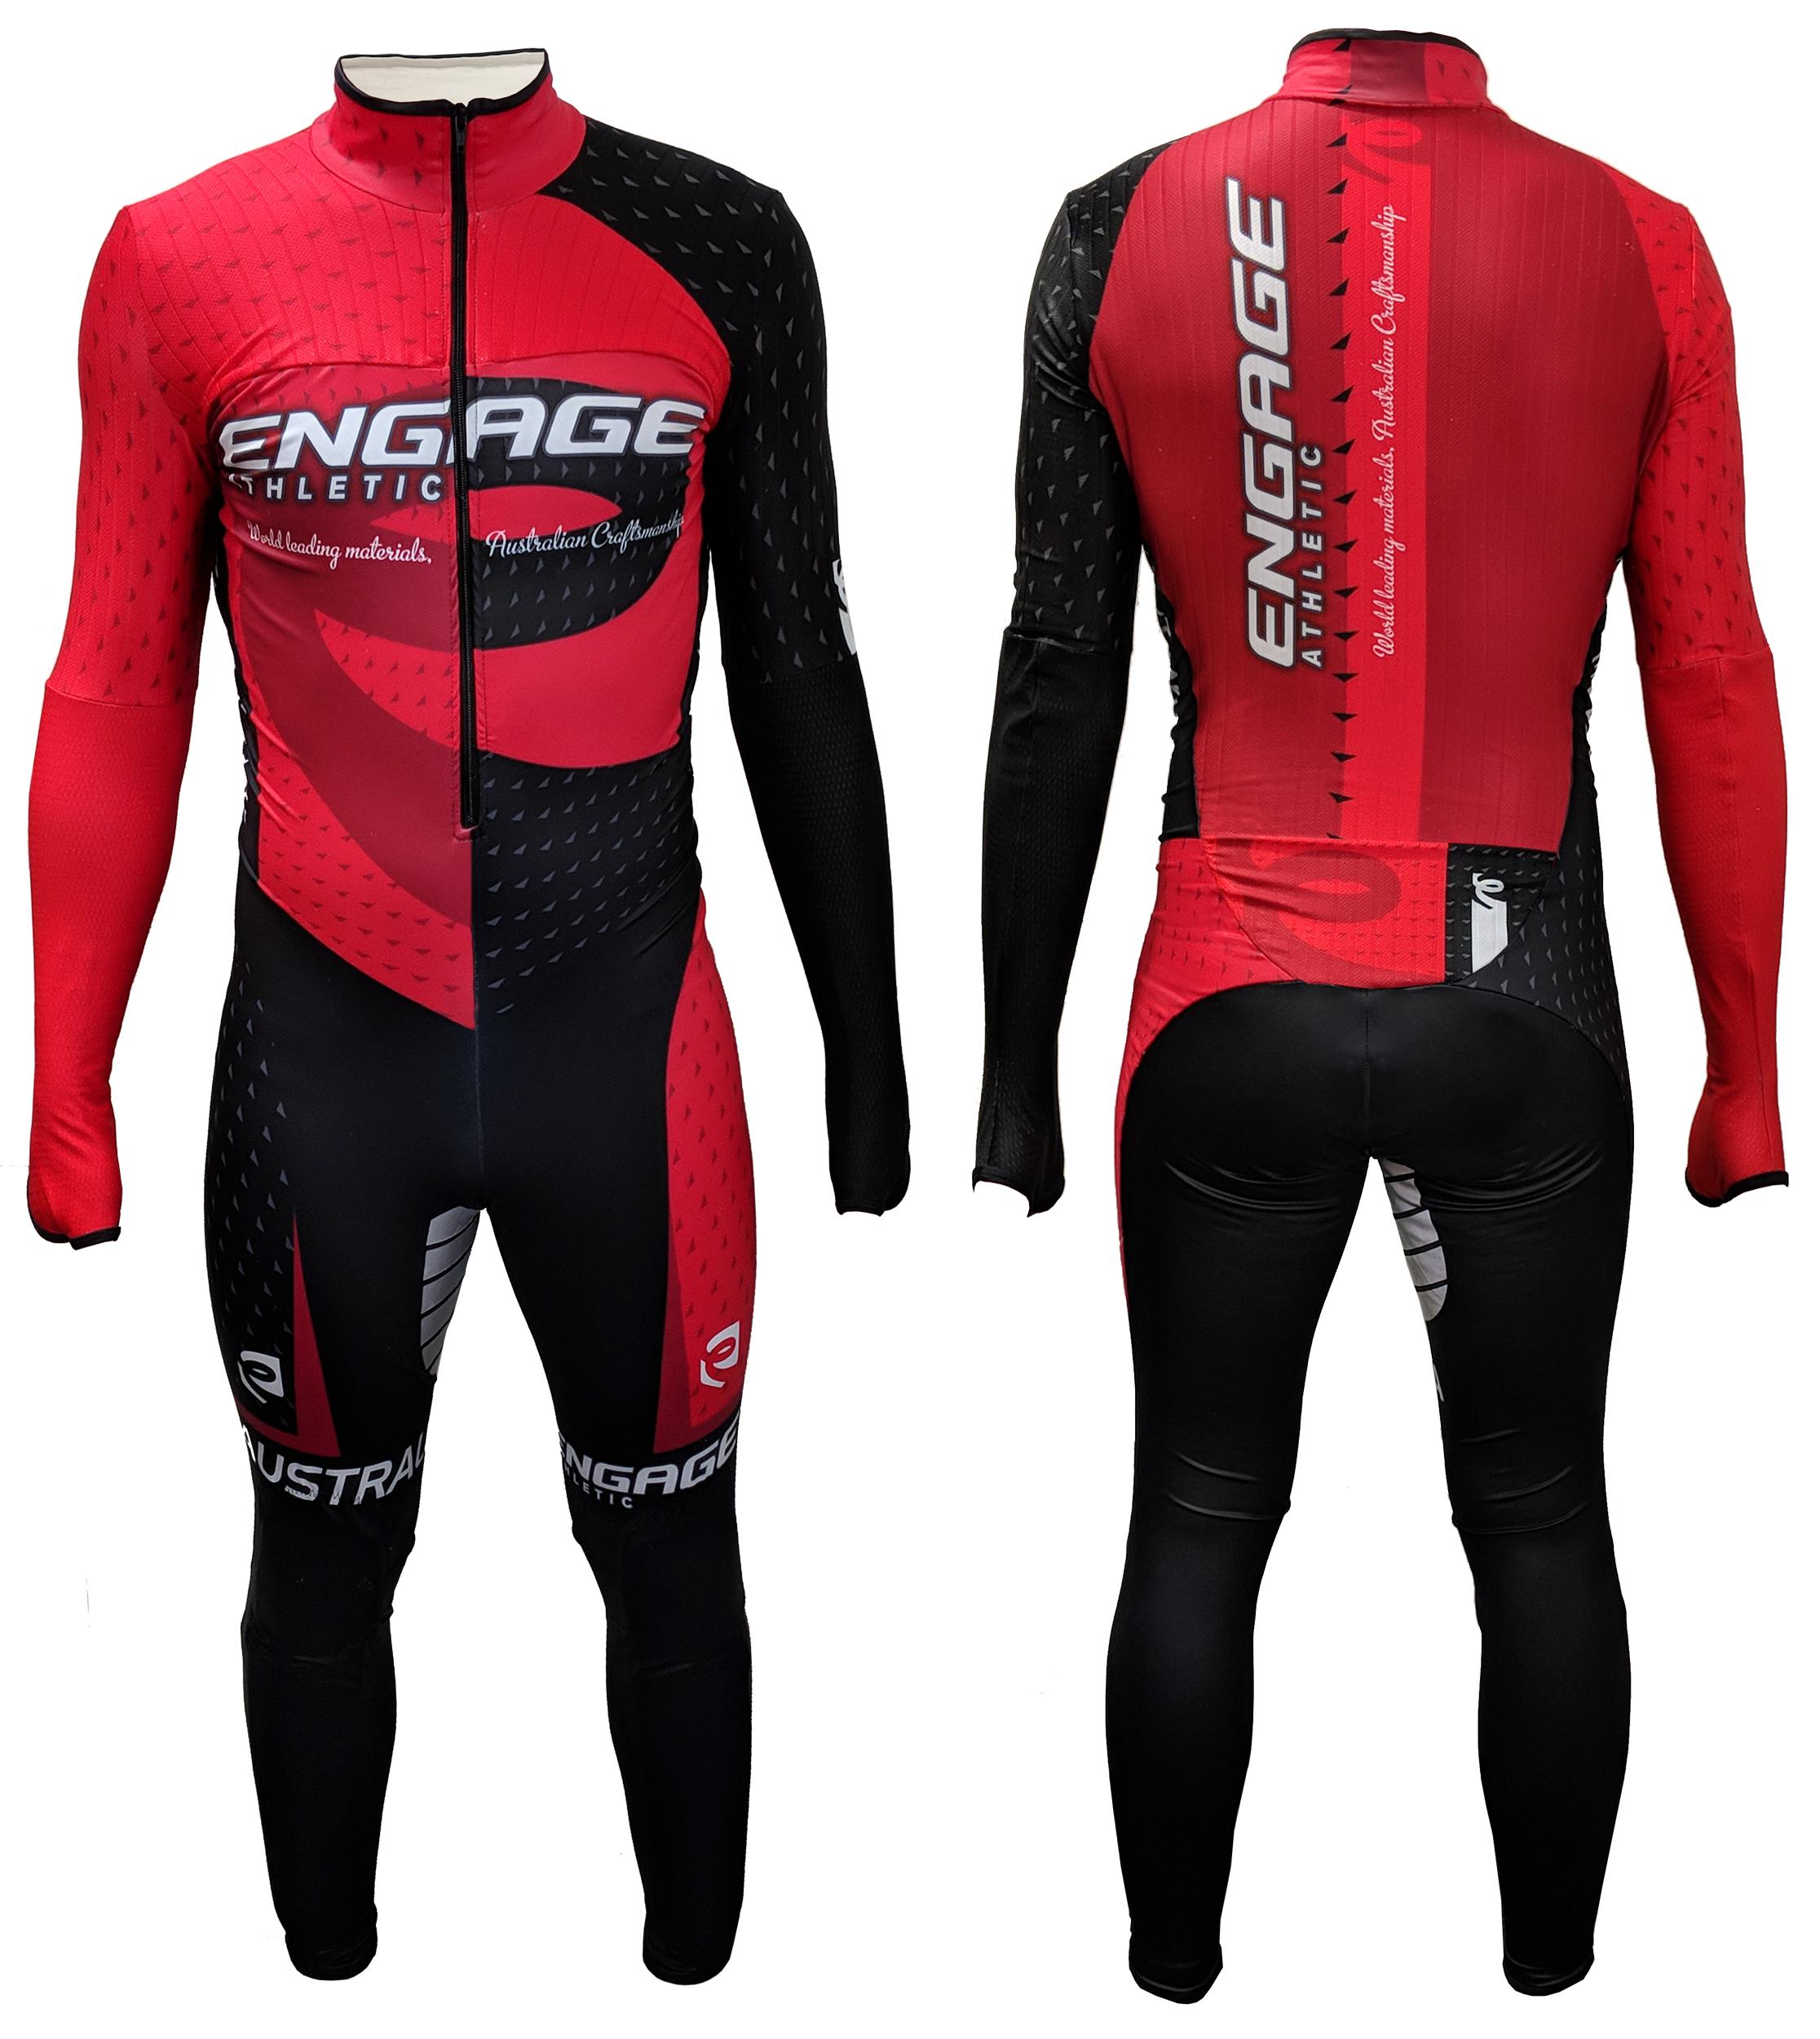 Performance Aero Short Track Dyneema Level 3 EN388 Full Cut Resistant Suit